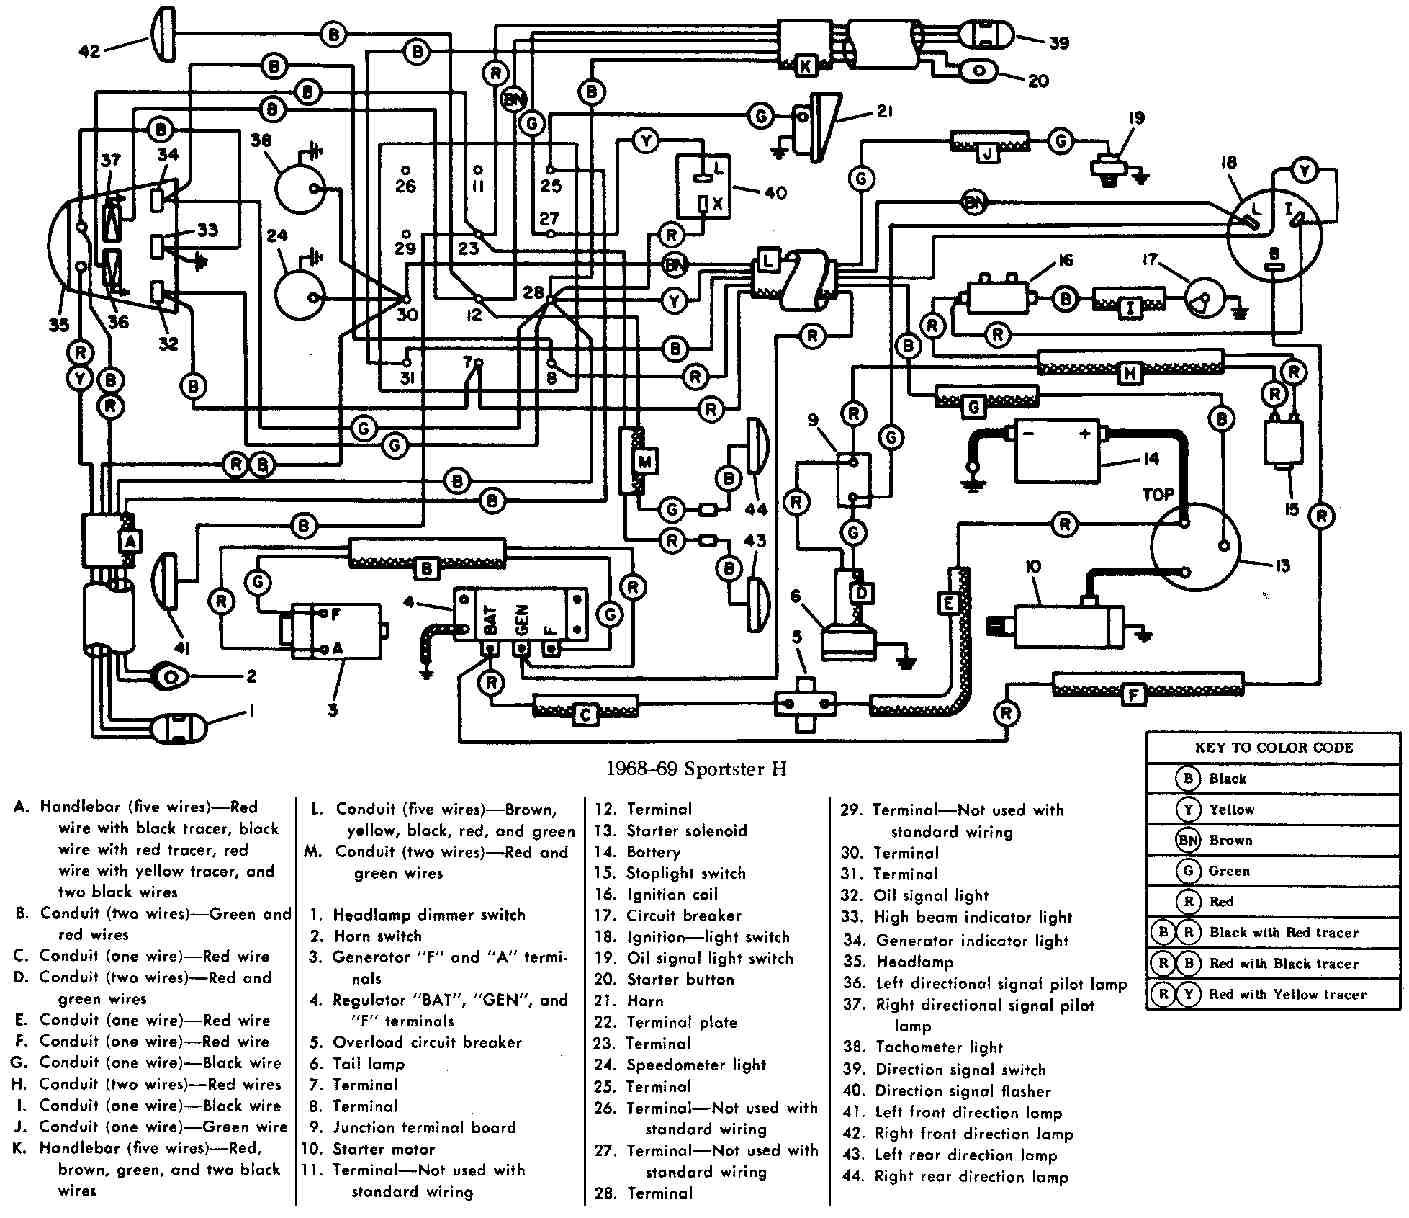 hight resolution of 1973 flh wiring diagram dash wiring diagram autovehiclewiring diagrams online 6503 harley davidson forums wiring diagram